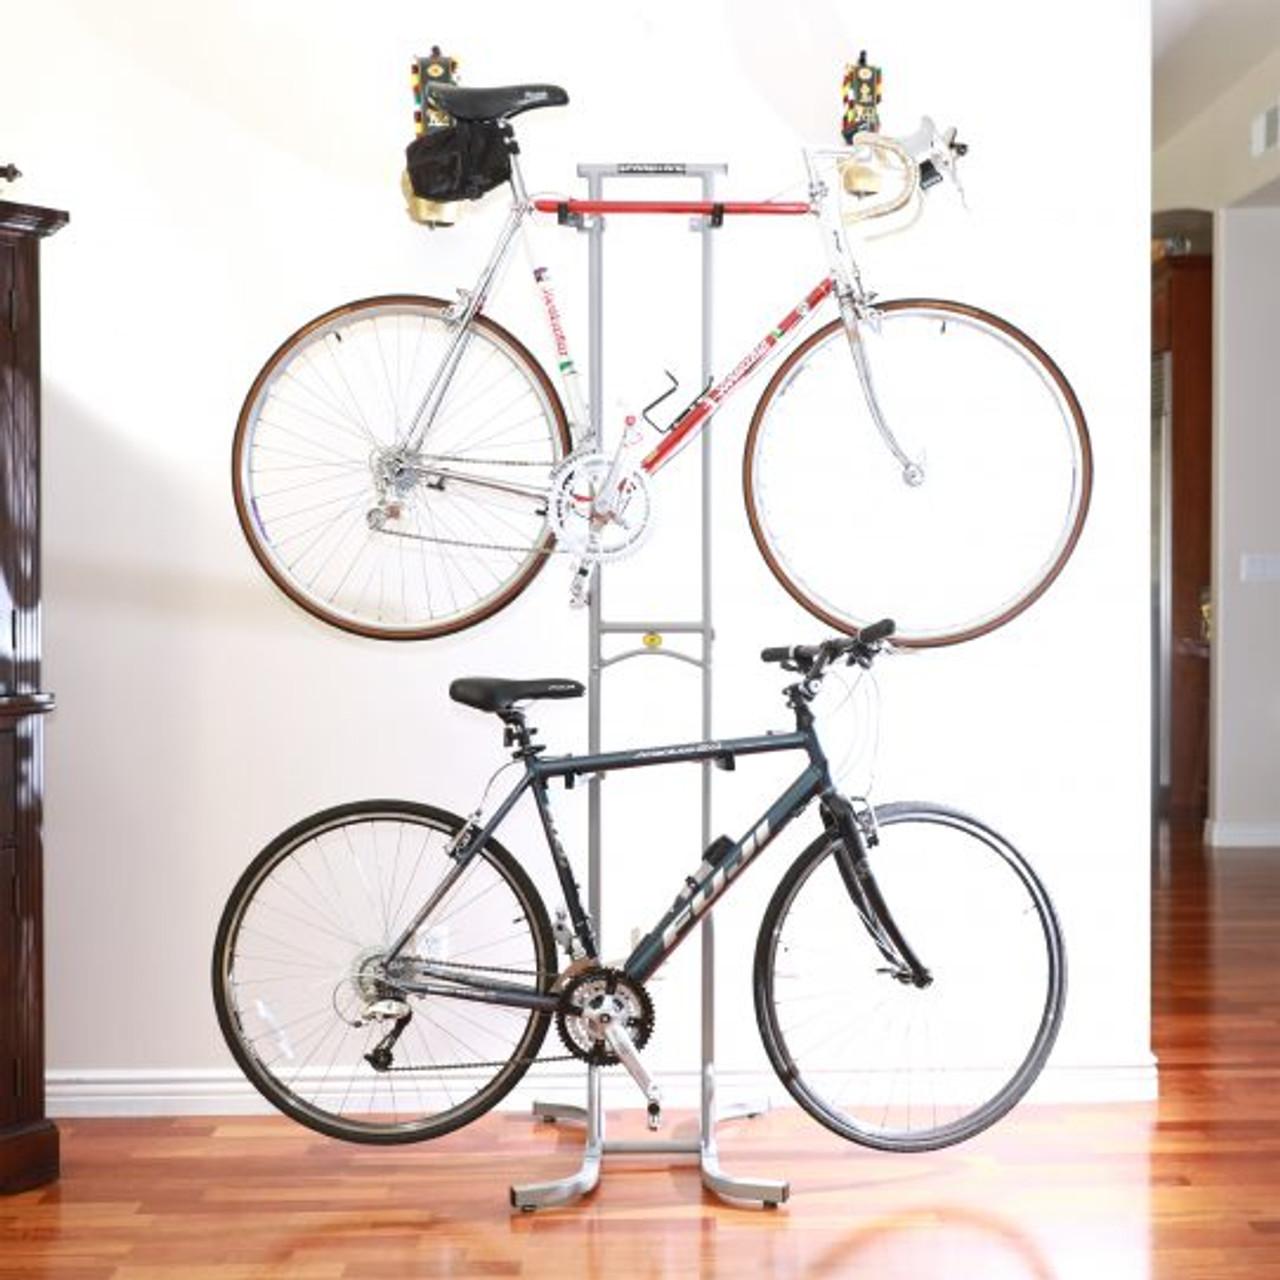 best home apartment garage freestanding bike rack for 2 bikes